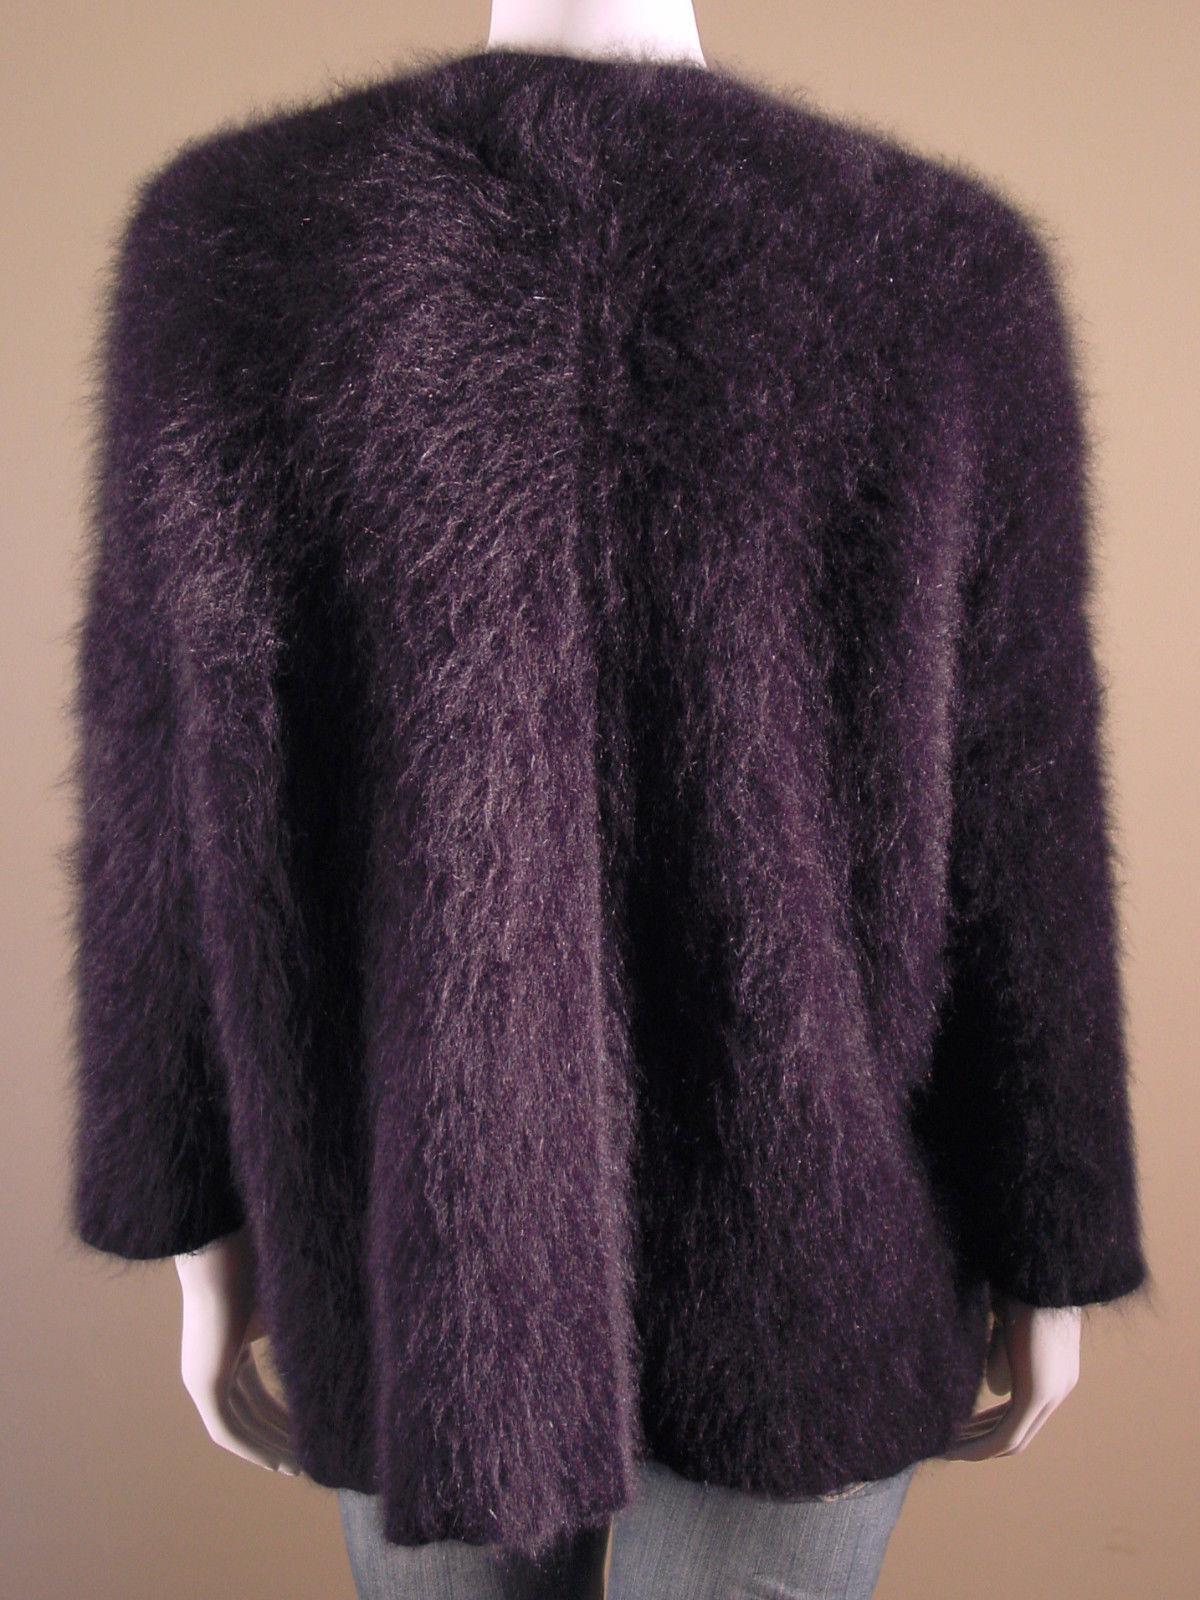 72806074_angora-sweater-h-m-black-2.jpg